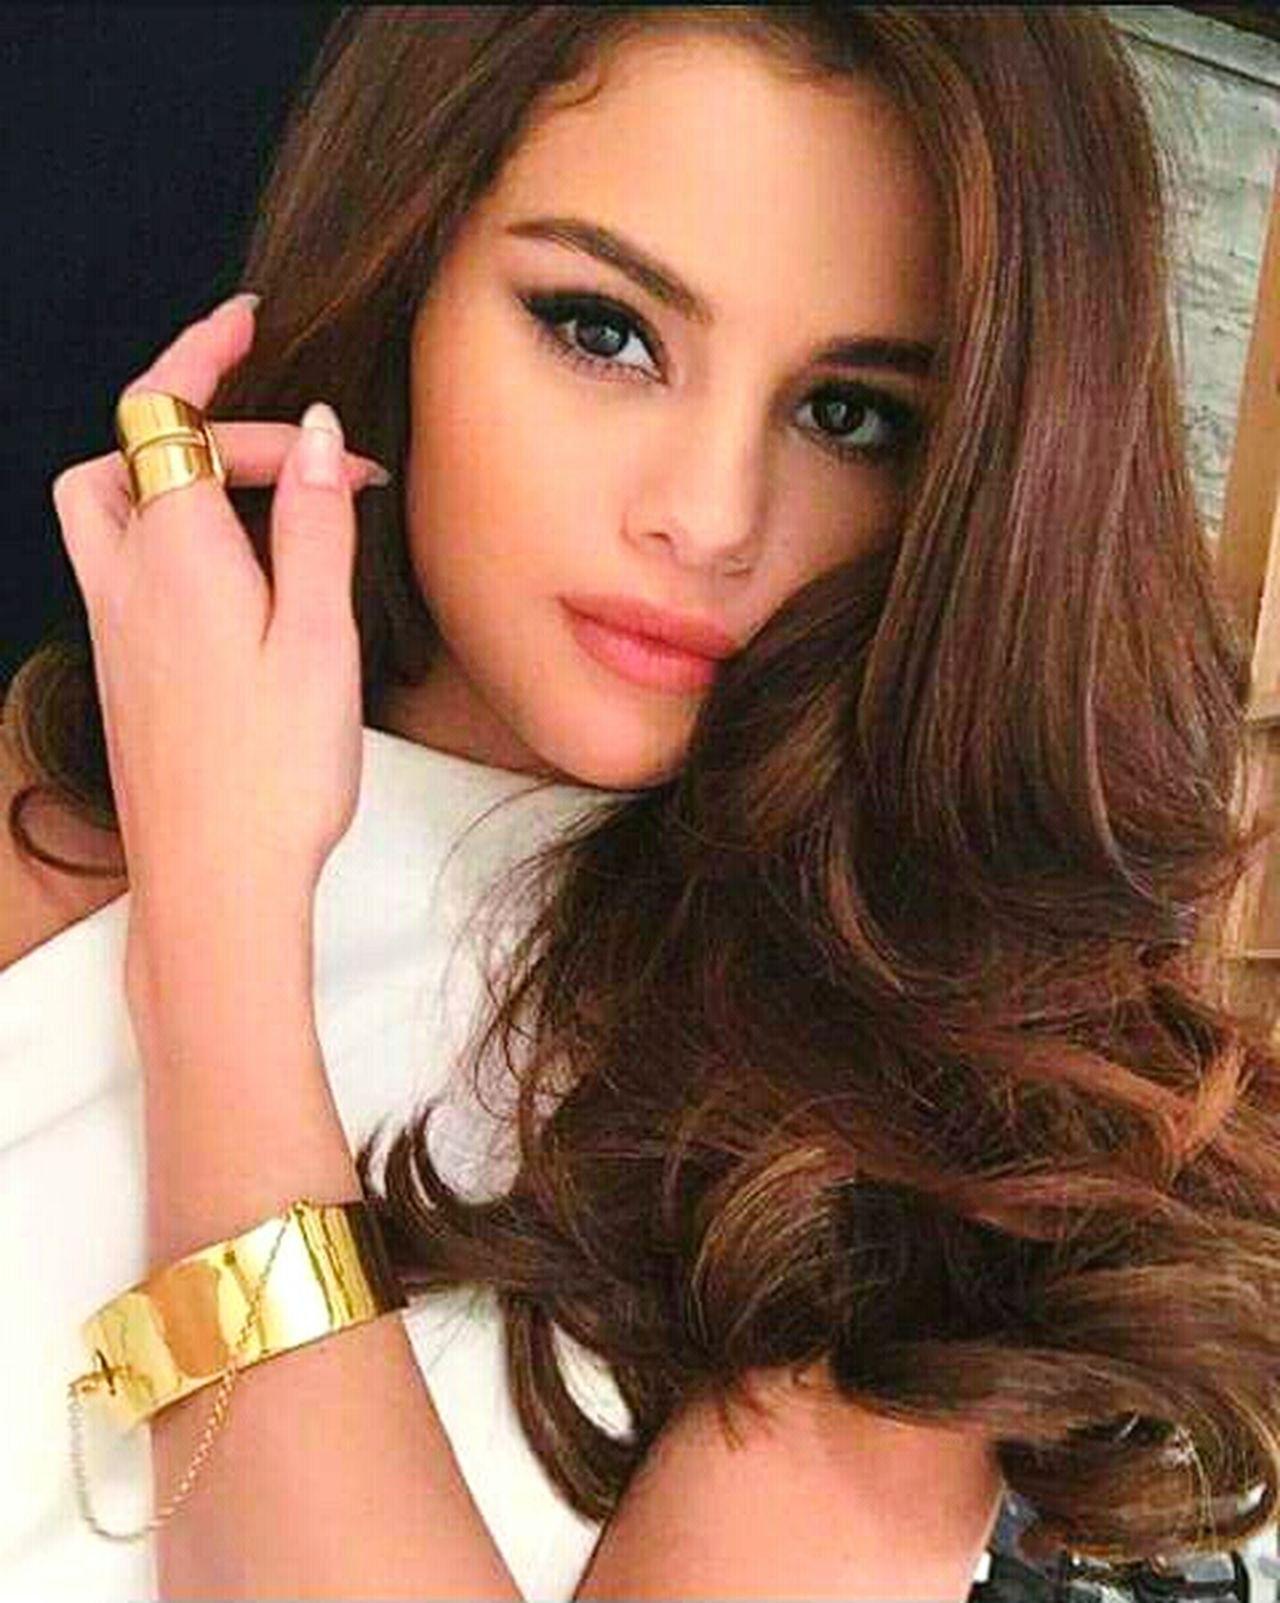 selena Gomez 😍 Long Hair One Woman Only Close-up Beautiful Woman Selena Gomez ❤